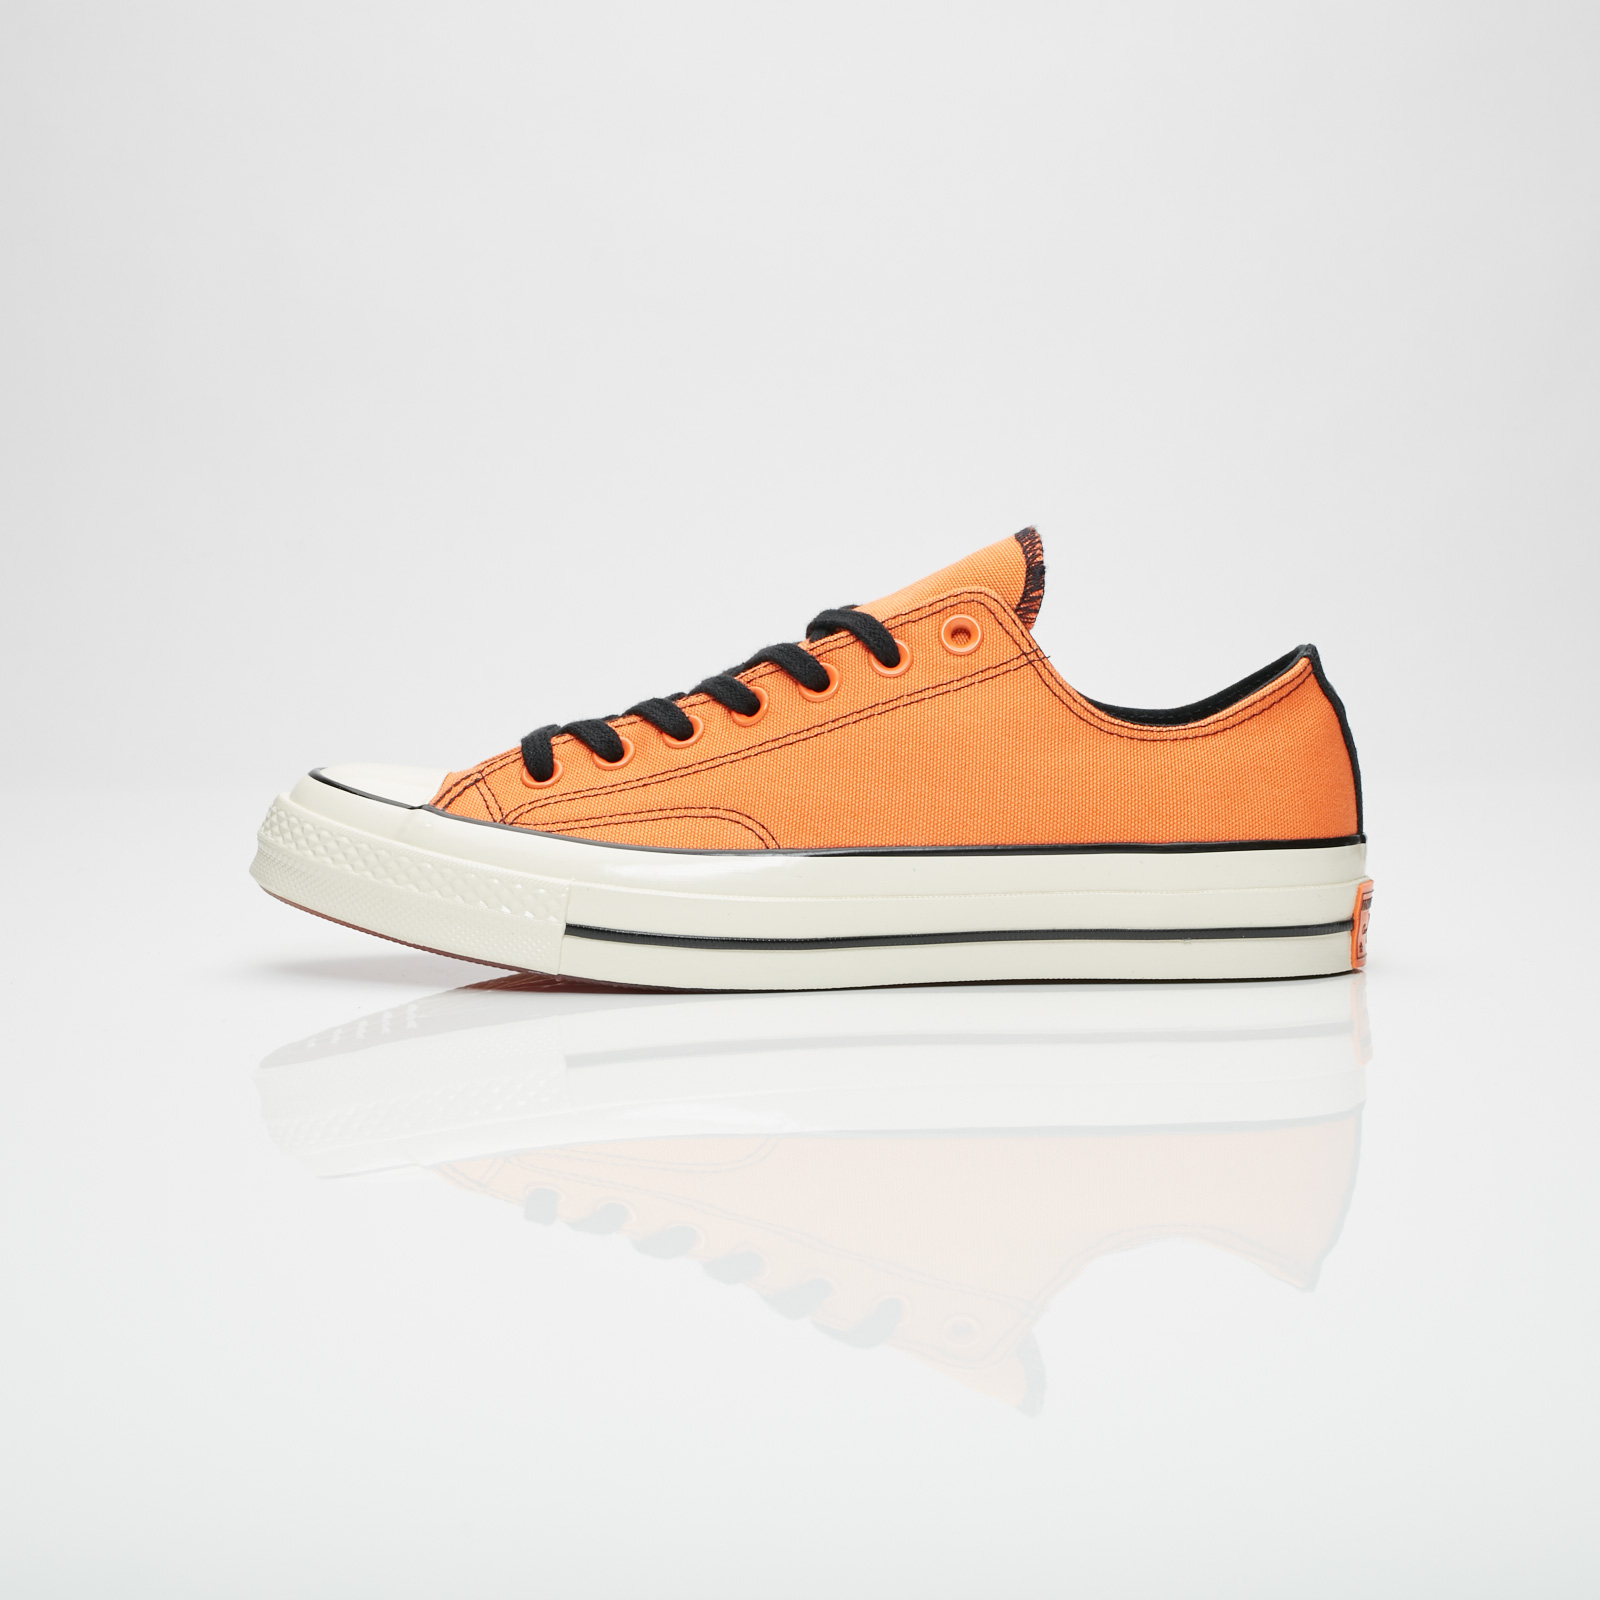 wholesale dealer 7acab 27c36 Converse Chuck Taylor All Star 70 Ox x Vince Staples - 161254c -  Sneakersnstuff | sneakers & streetwear online since 1999